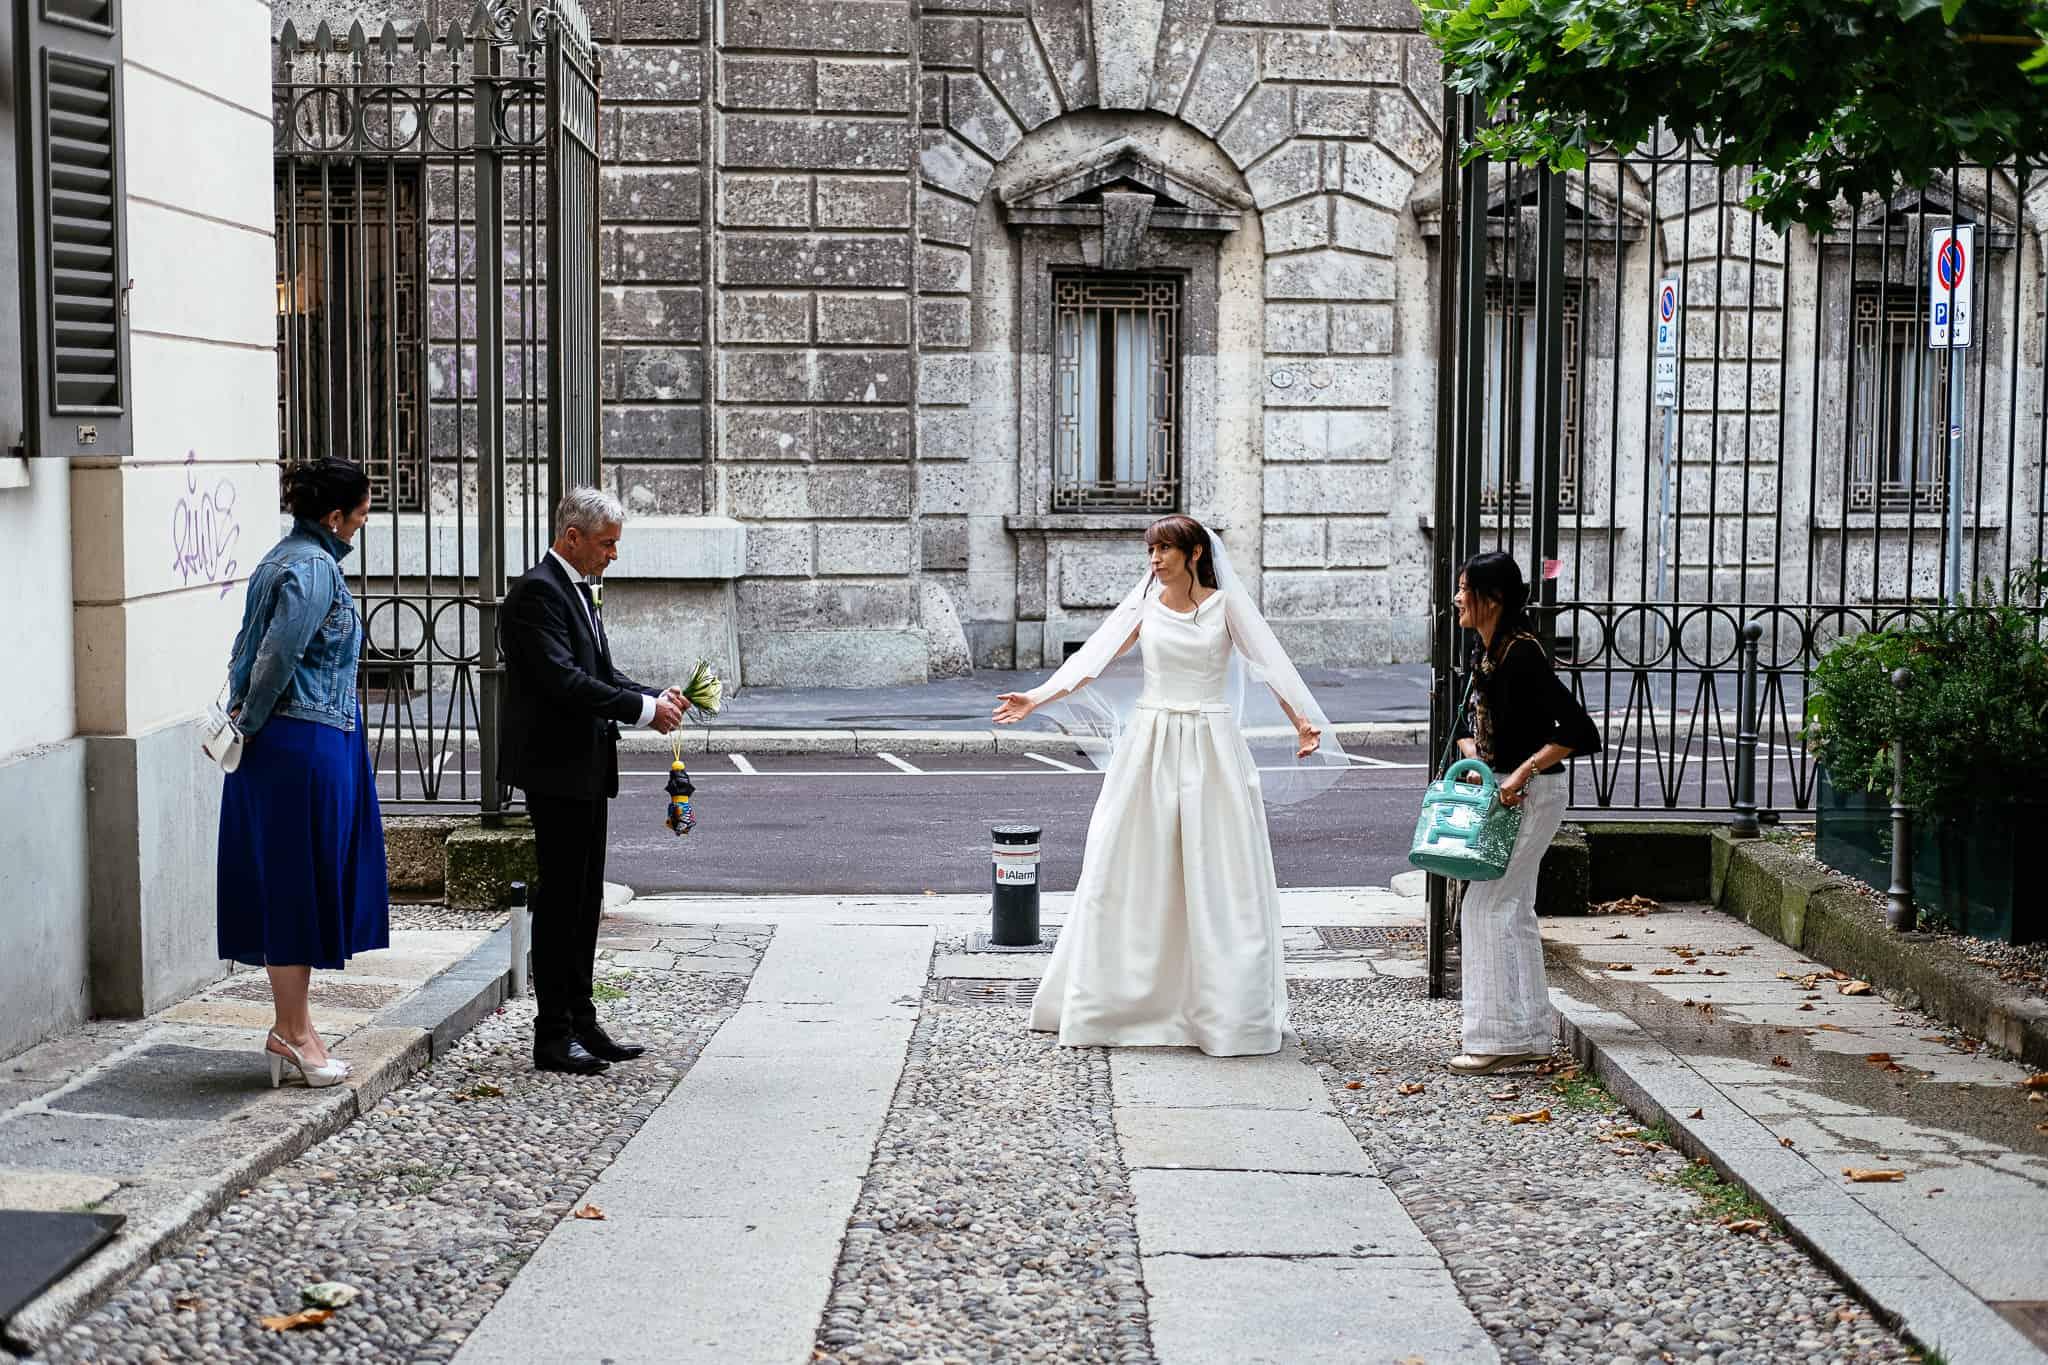 matrimonio Canter Milano San siro Luca rossi wedding reportage 0024